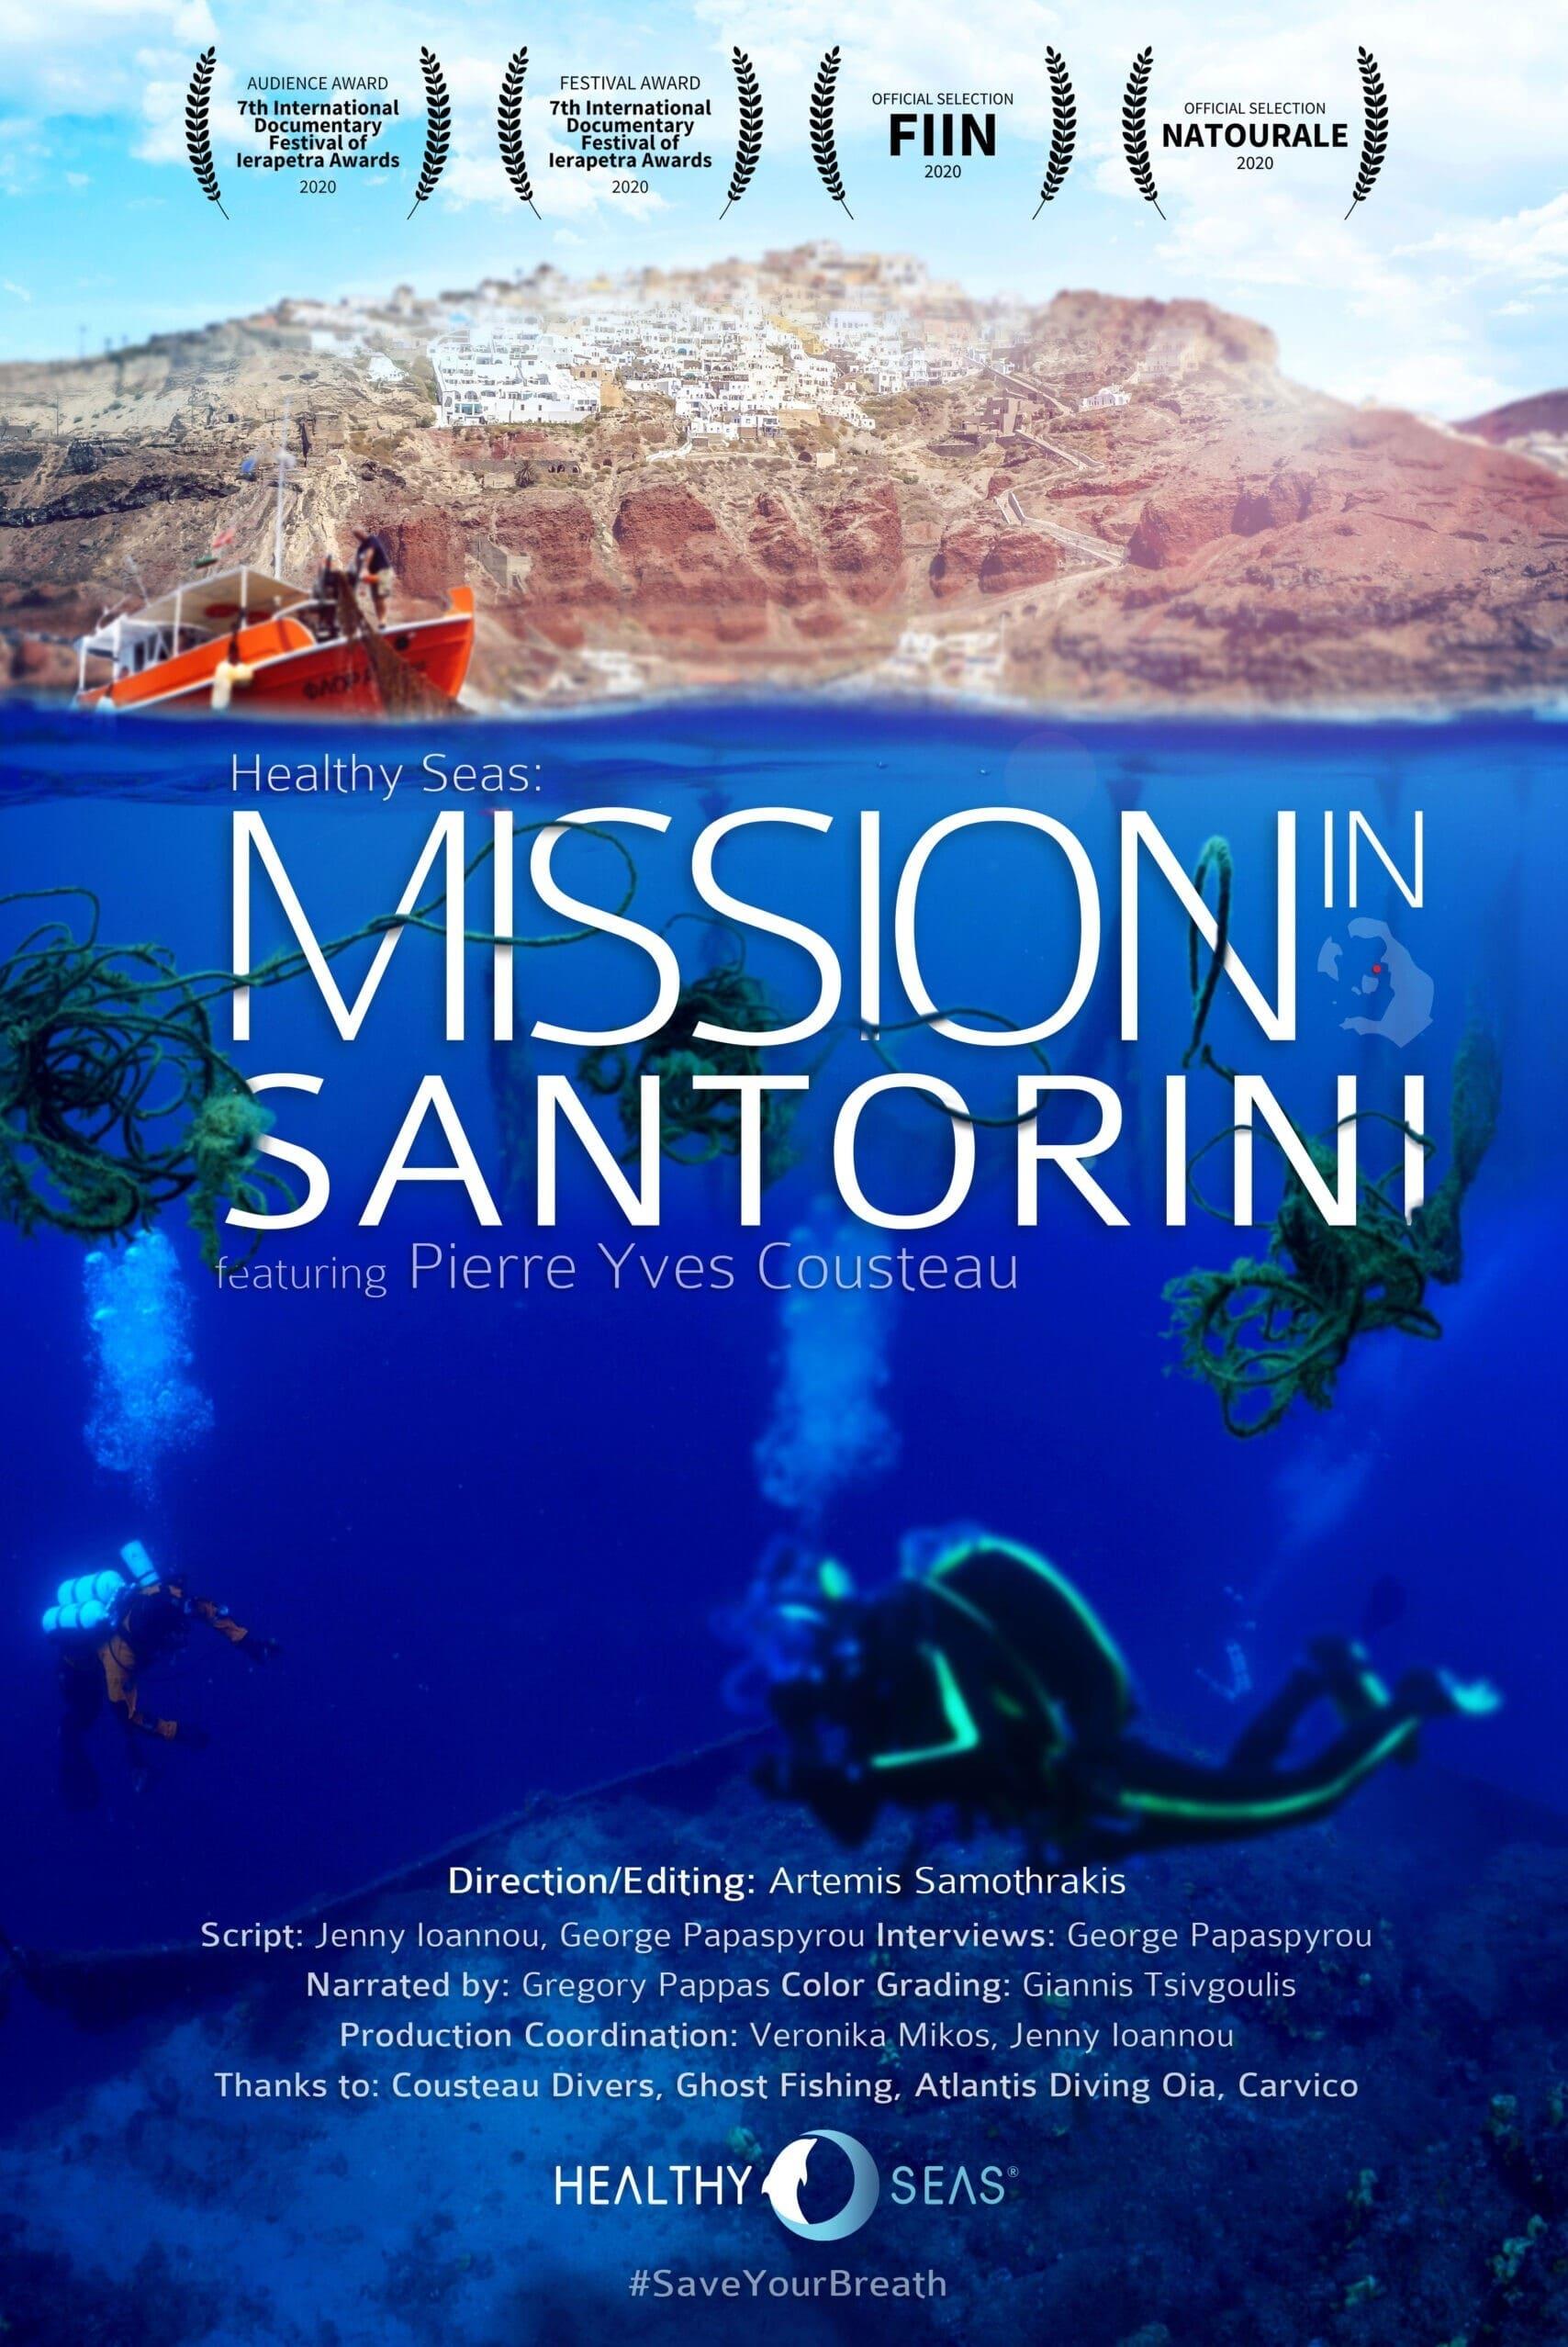 Health Seas: Mission to Santorini